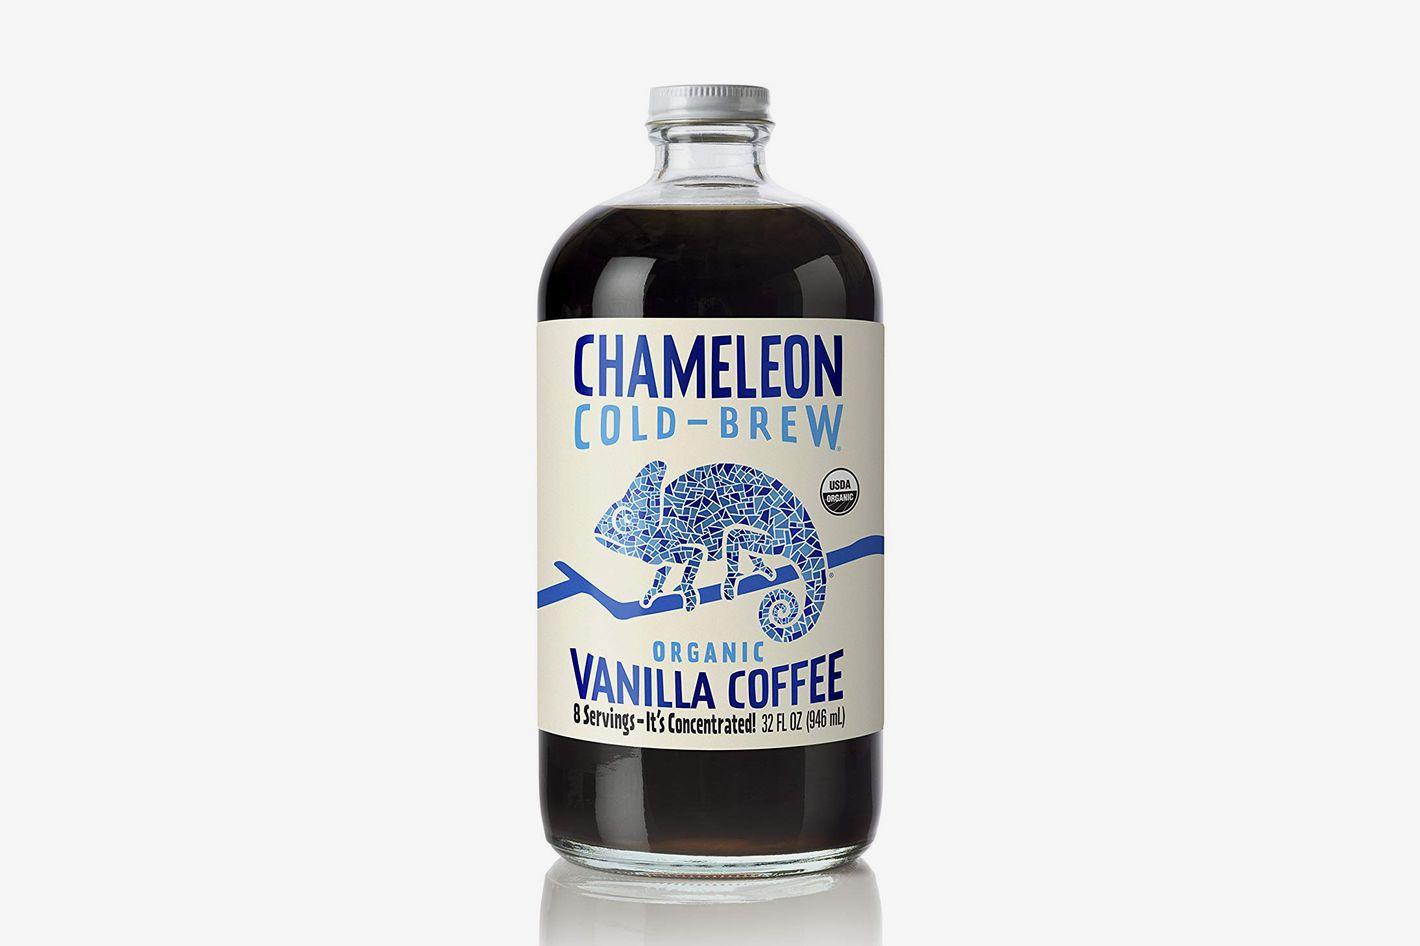 Chameleon Cold-Brew Vanilla Coffee Concentrate